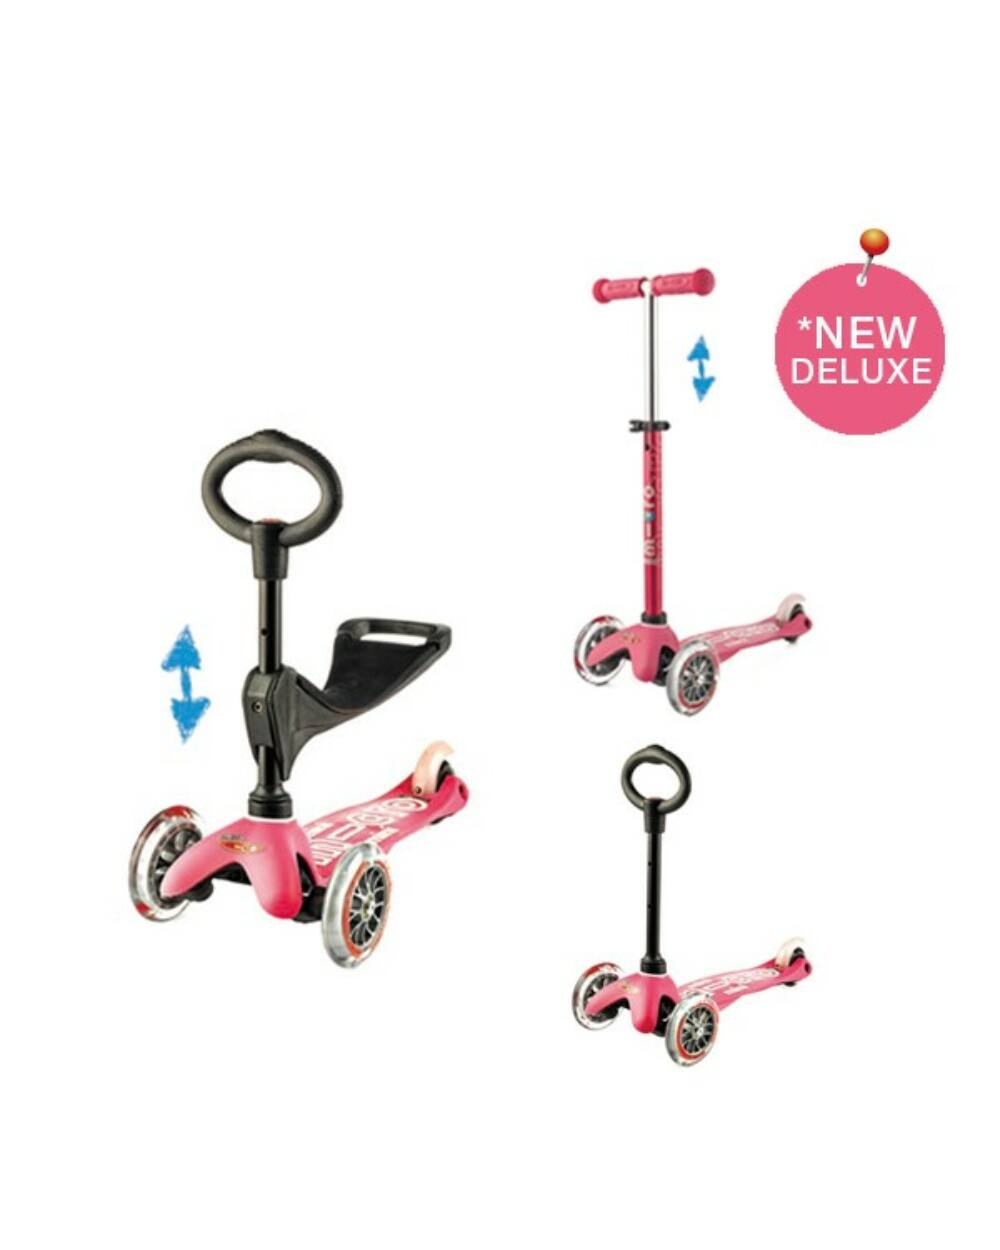 3in1 Mini Micro Deluxe roller, pink